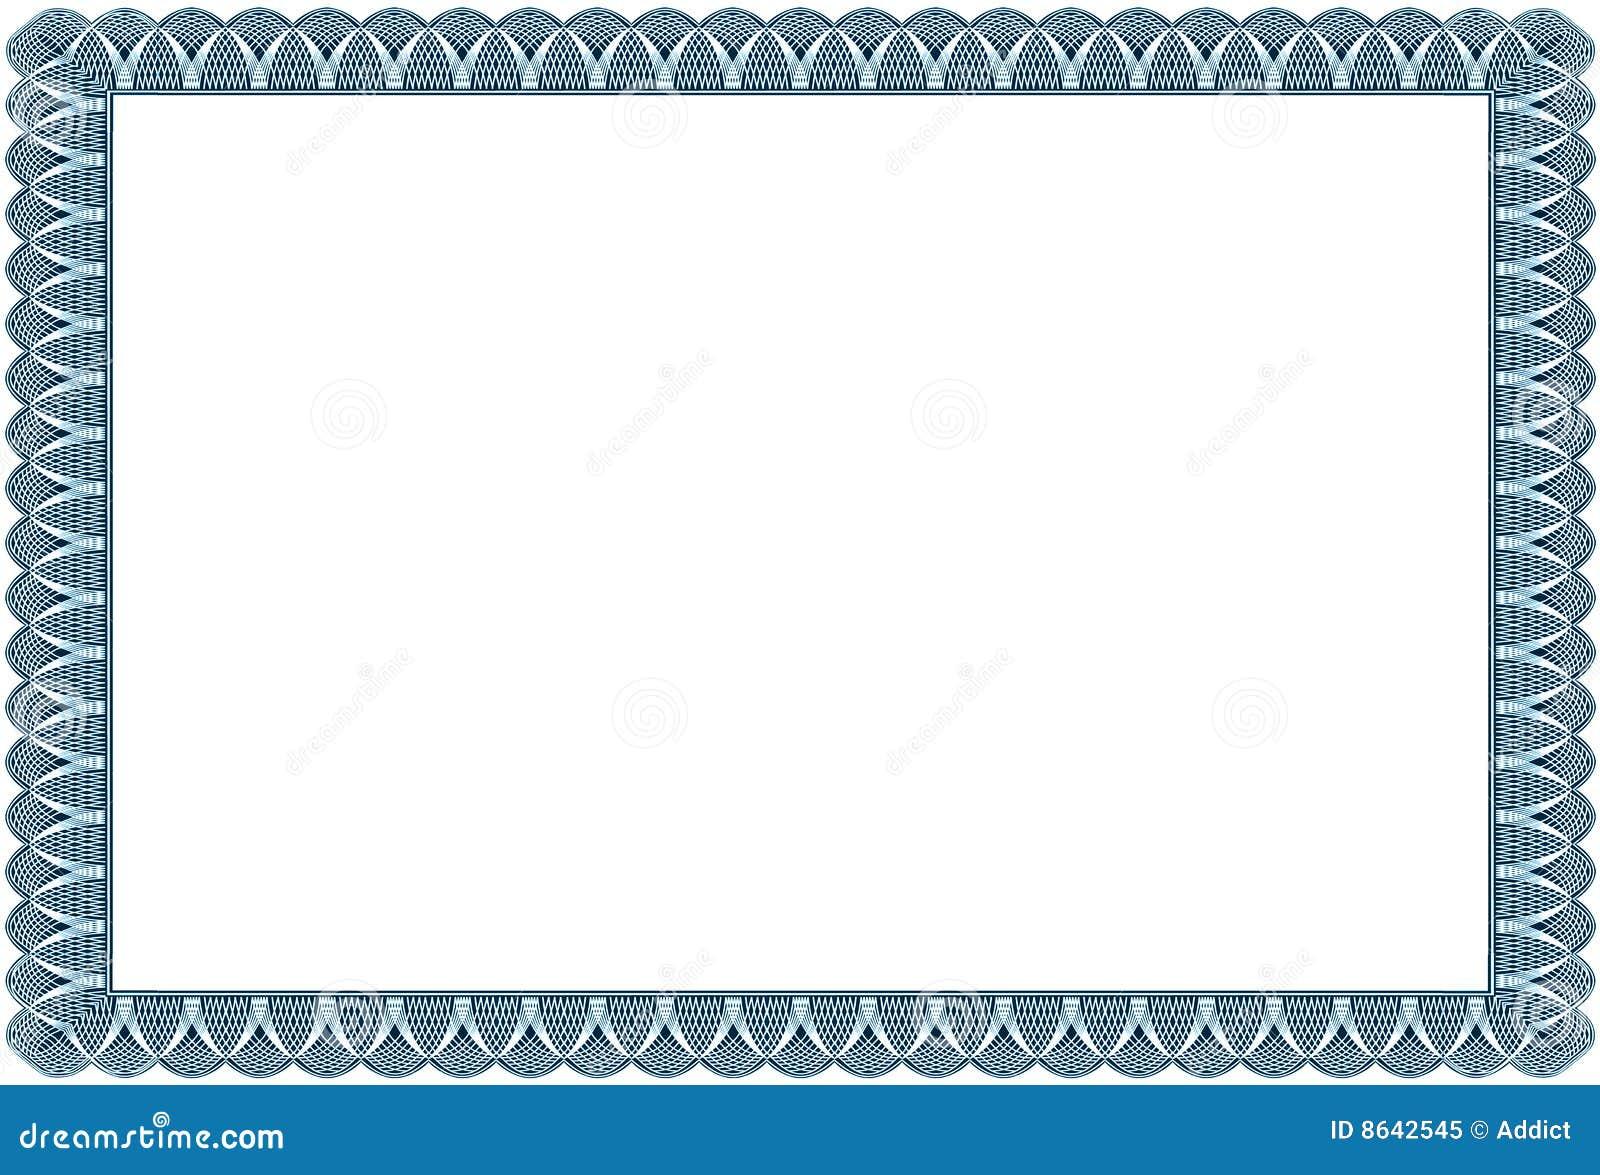 Certification Border Royalty Free Stock Photo Image 8642545